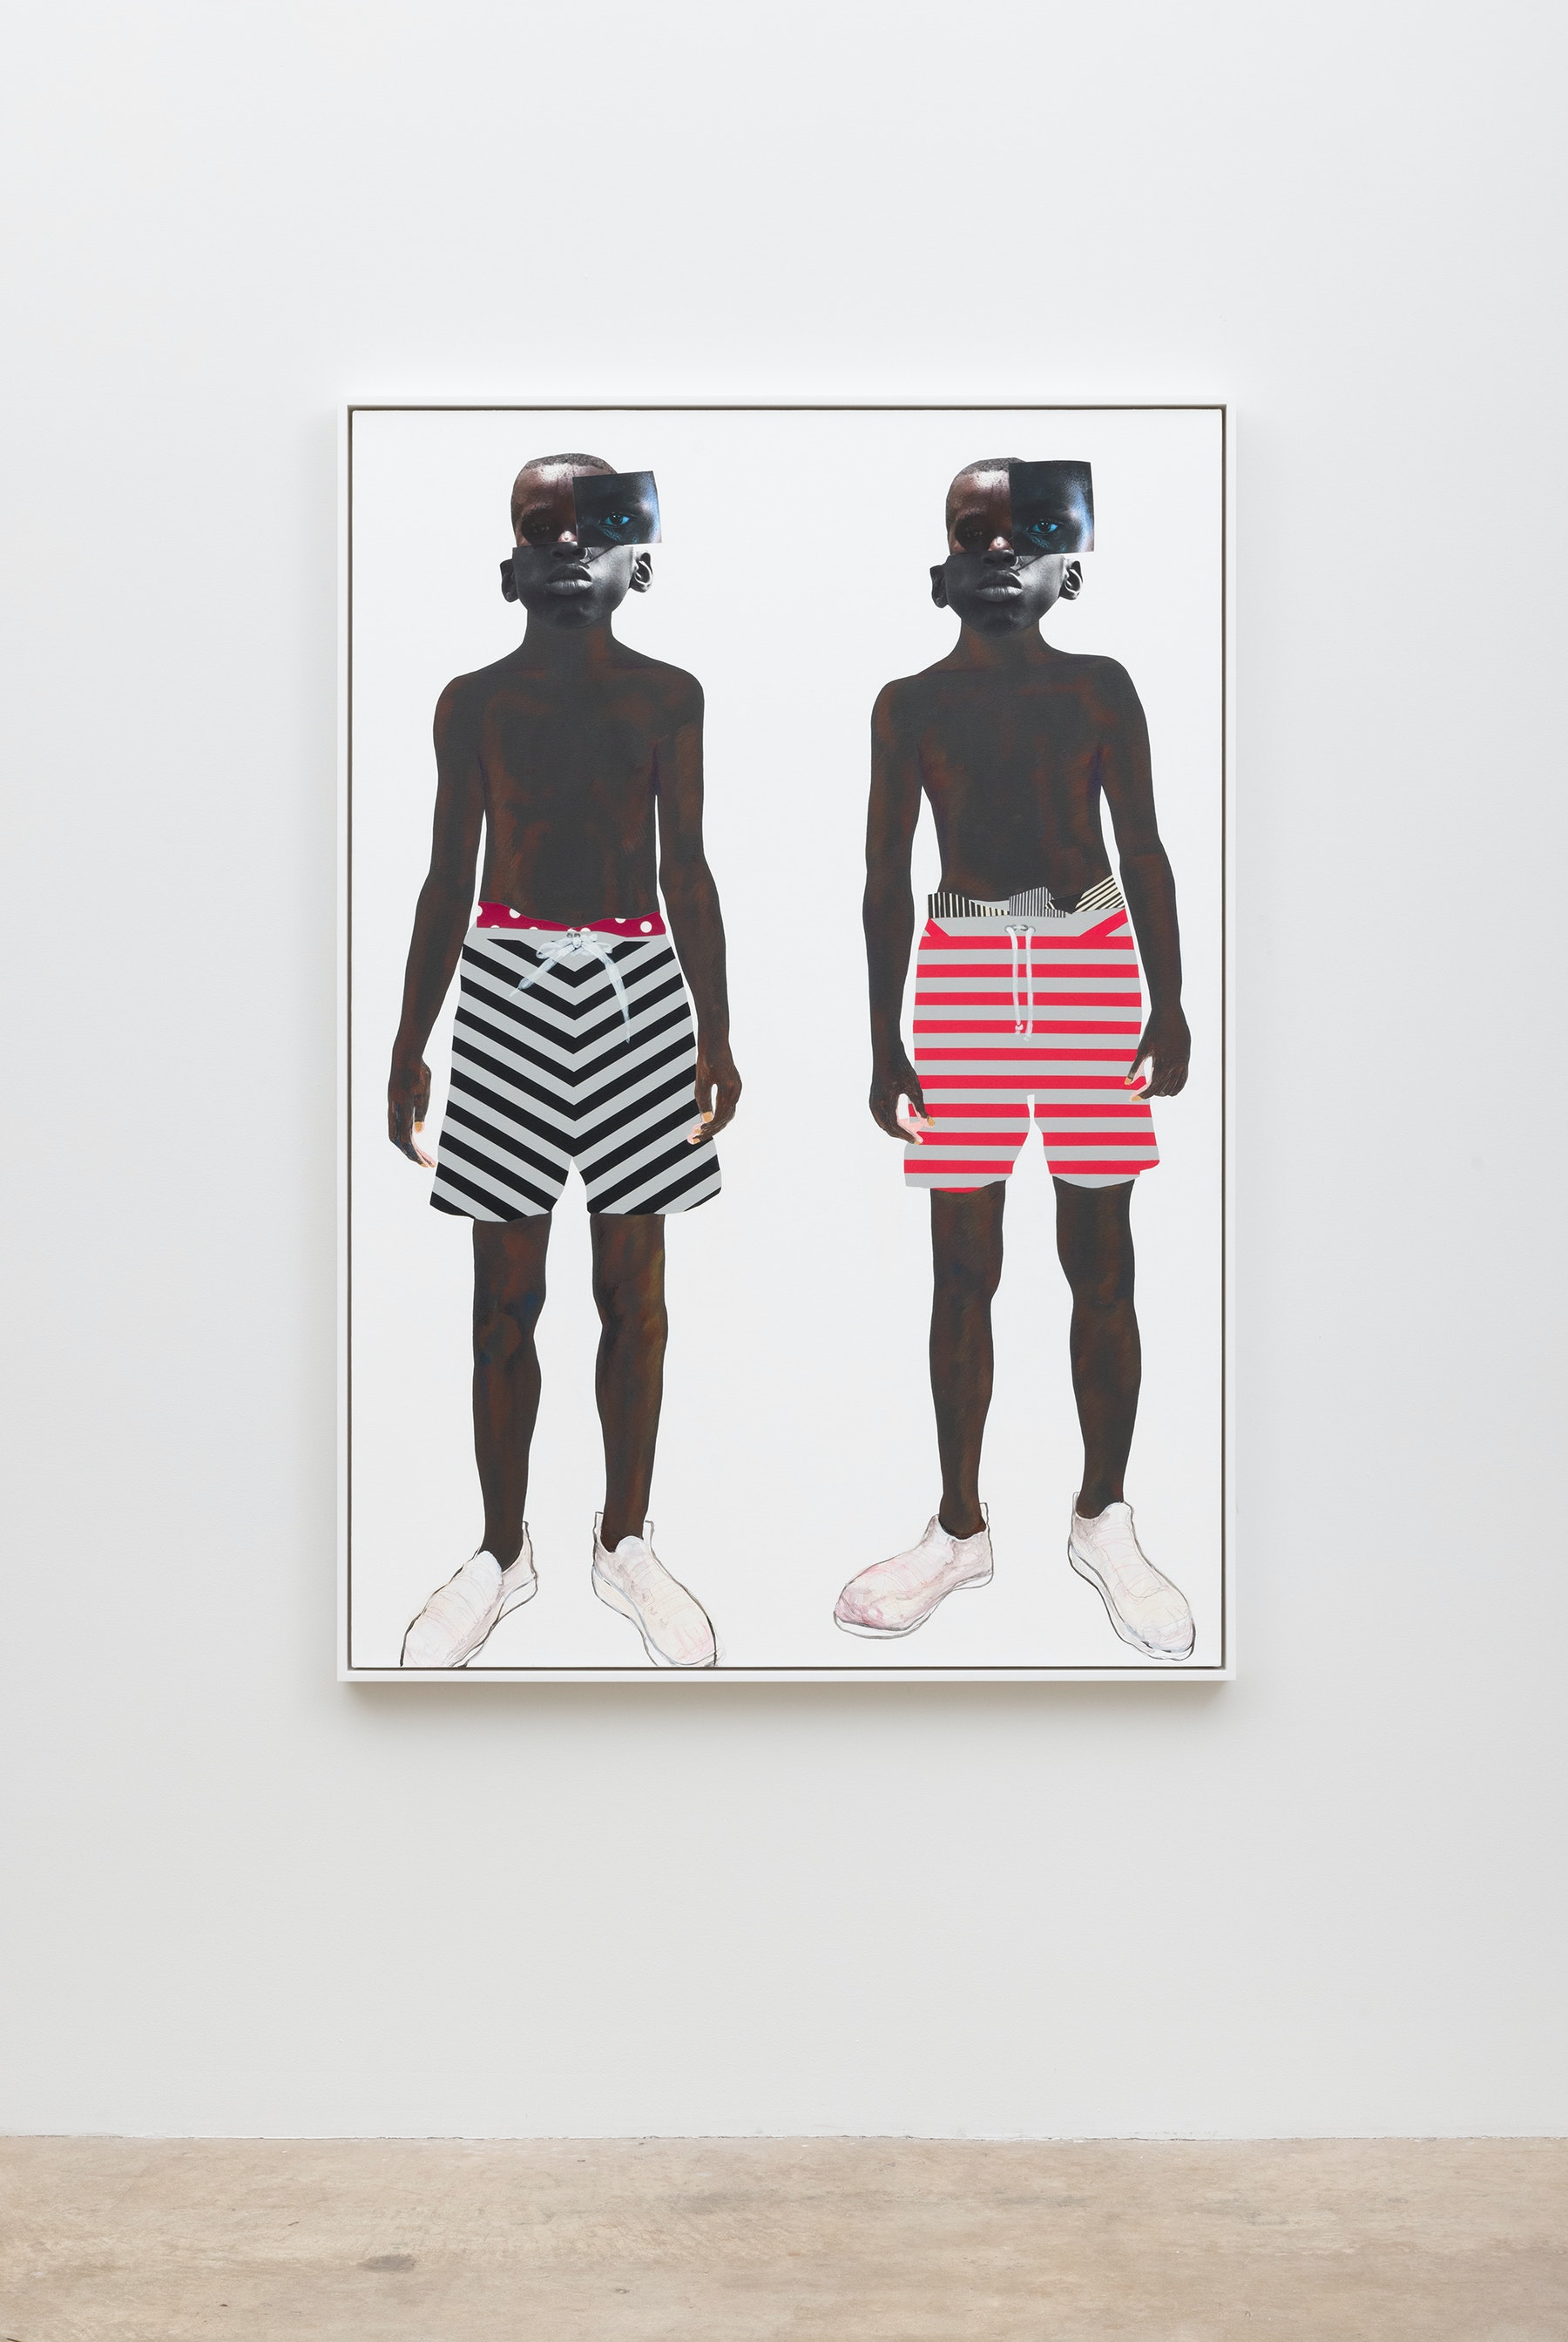 "Deborah Roberts ""Pool boys,"" 2019 Mixed media collage on canvas 65"" x 45"" [HxW] (165.1 x 114.3 cm); 66 ¹⁄₂"" x 46 ¹⁄₂"" x 2 ¹⁄₄"" [HxWxD] (168.91 x 118.11 x 5.71 cm) framed Inventory #ROB453 Courtesy of the artist and Vielmetter Los Angeles Photo credit: Jeff McLane"